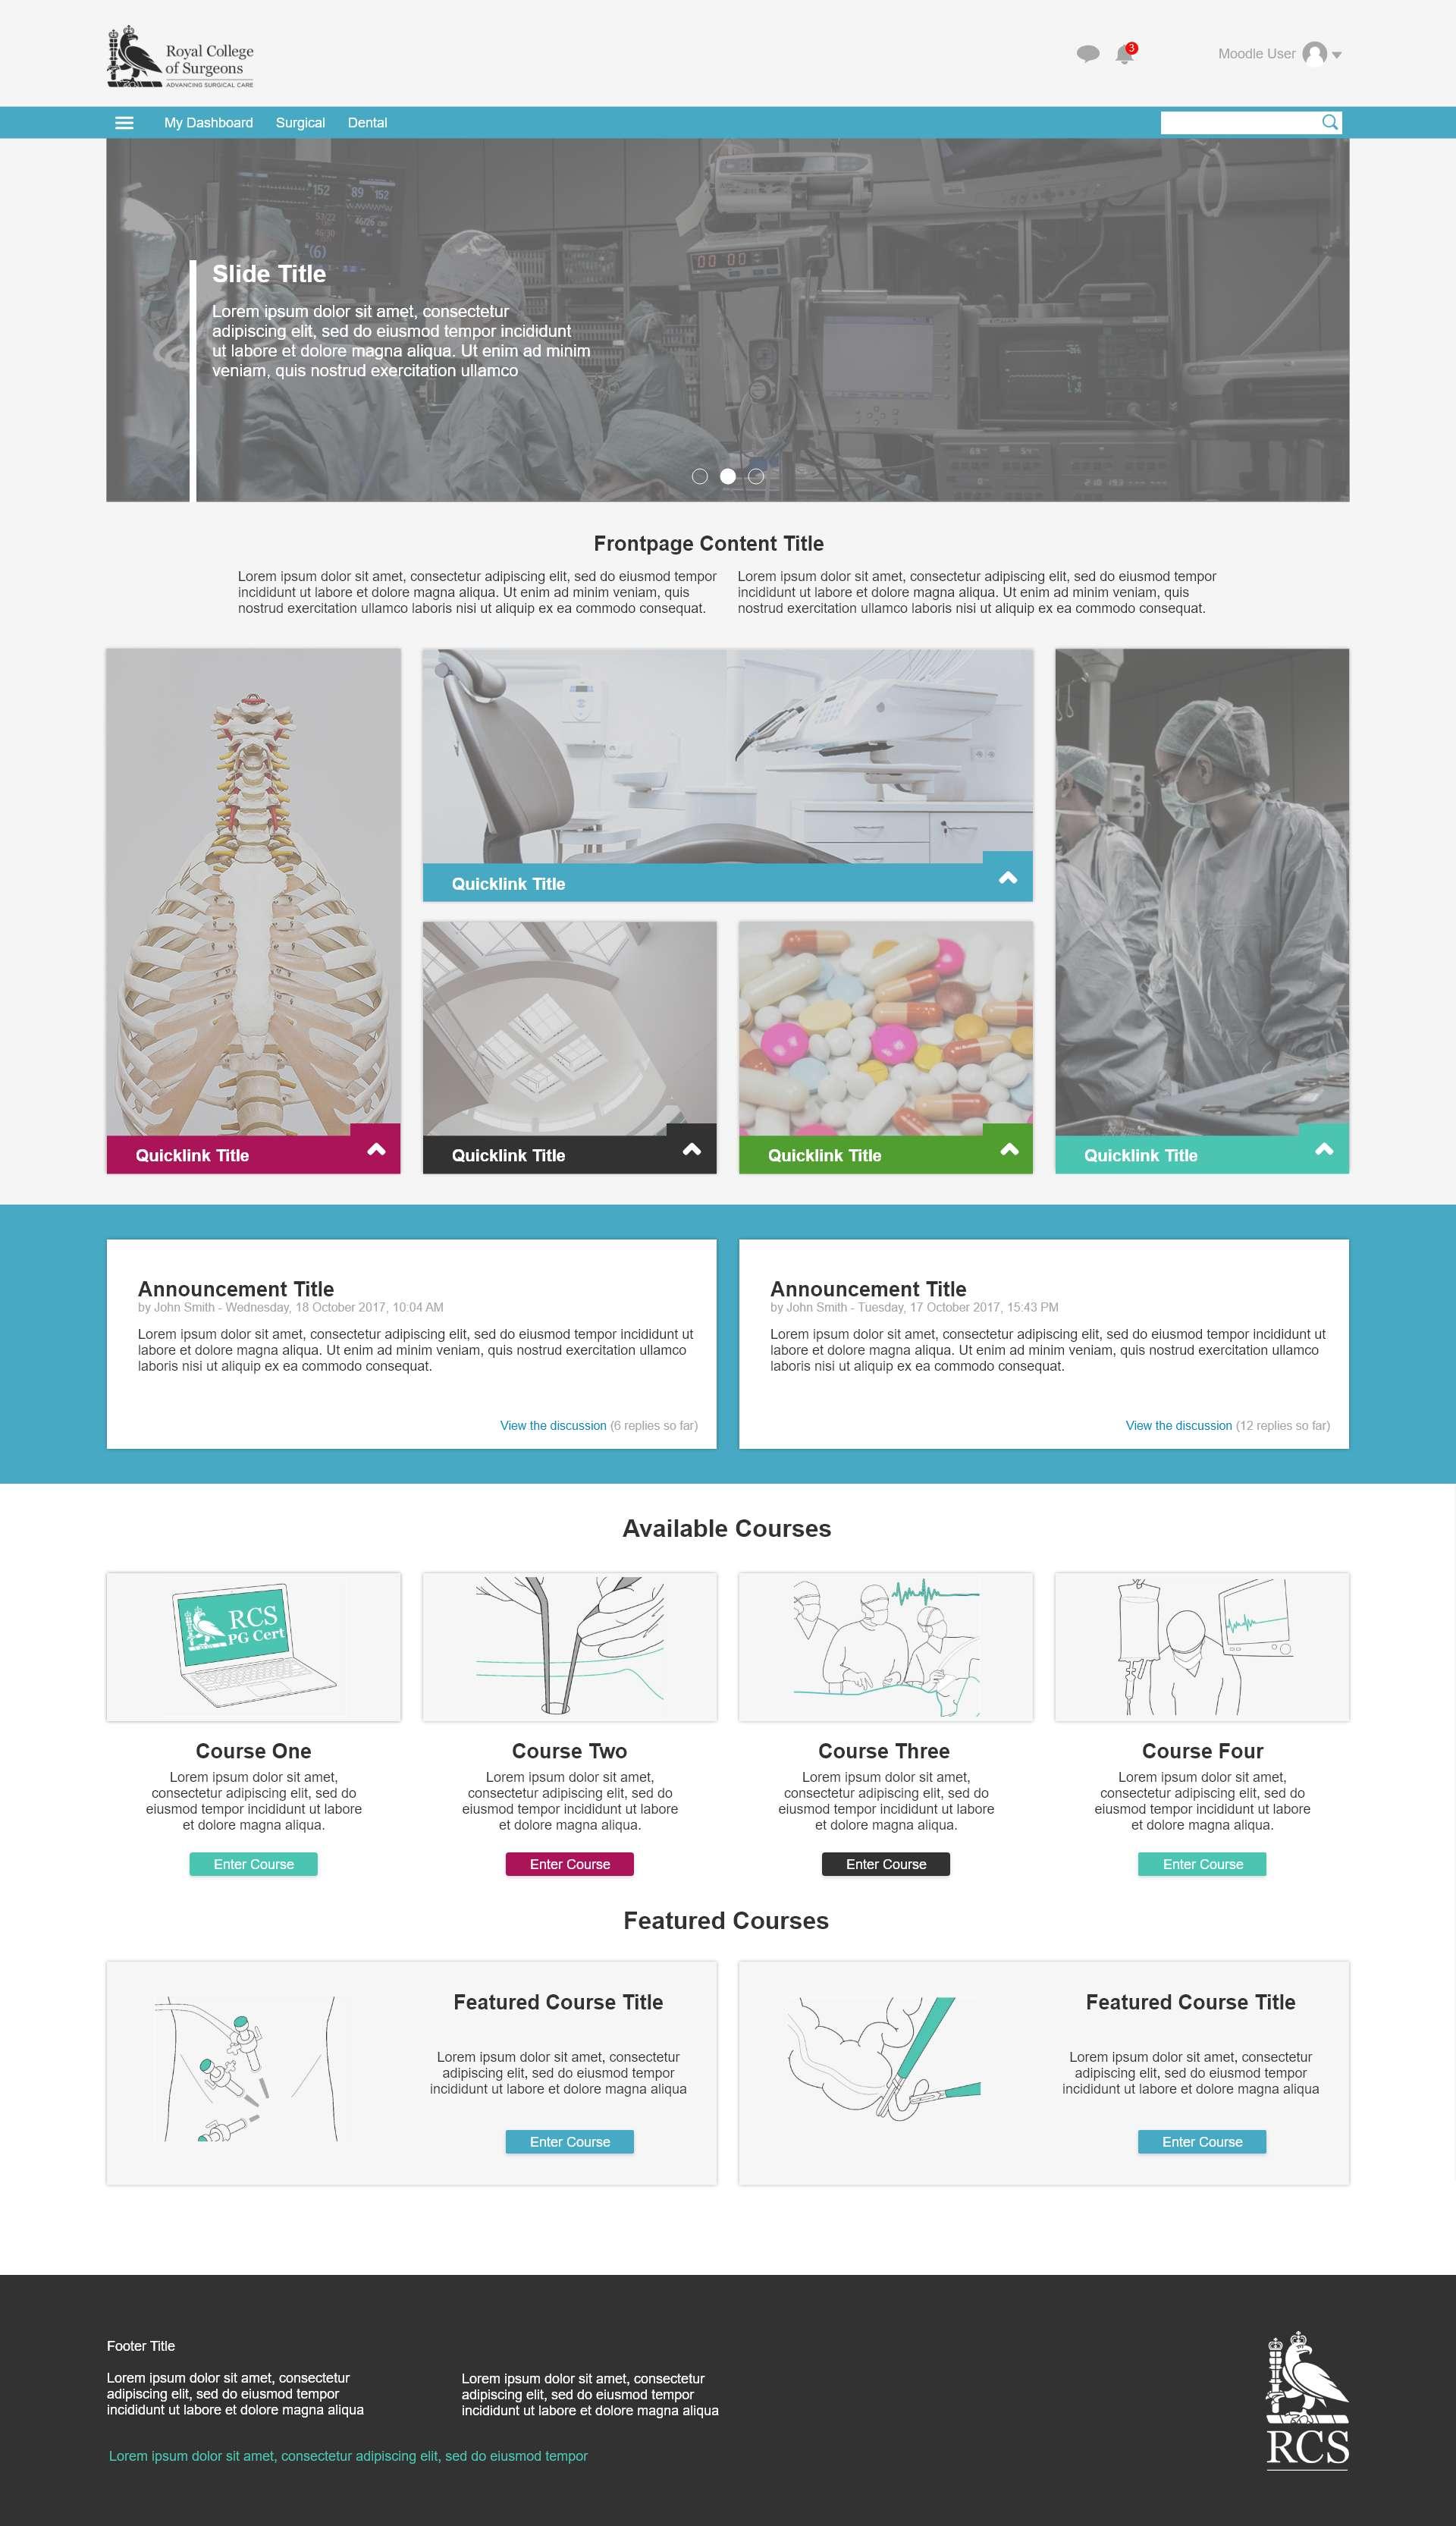 Design It - Royal College of Surgeons - Desktop